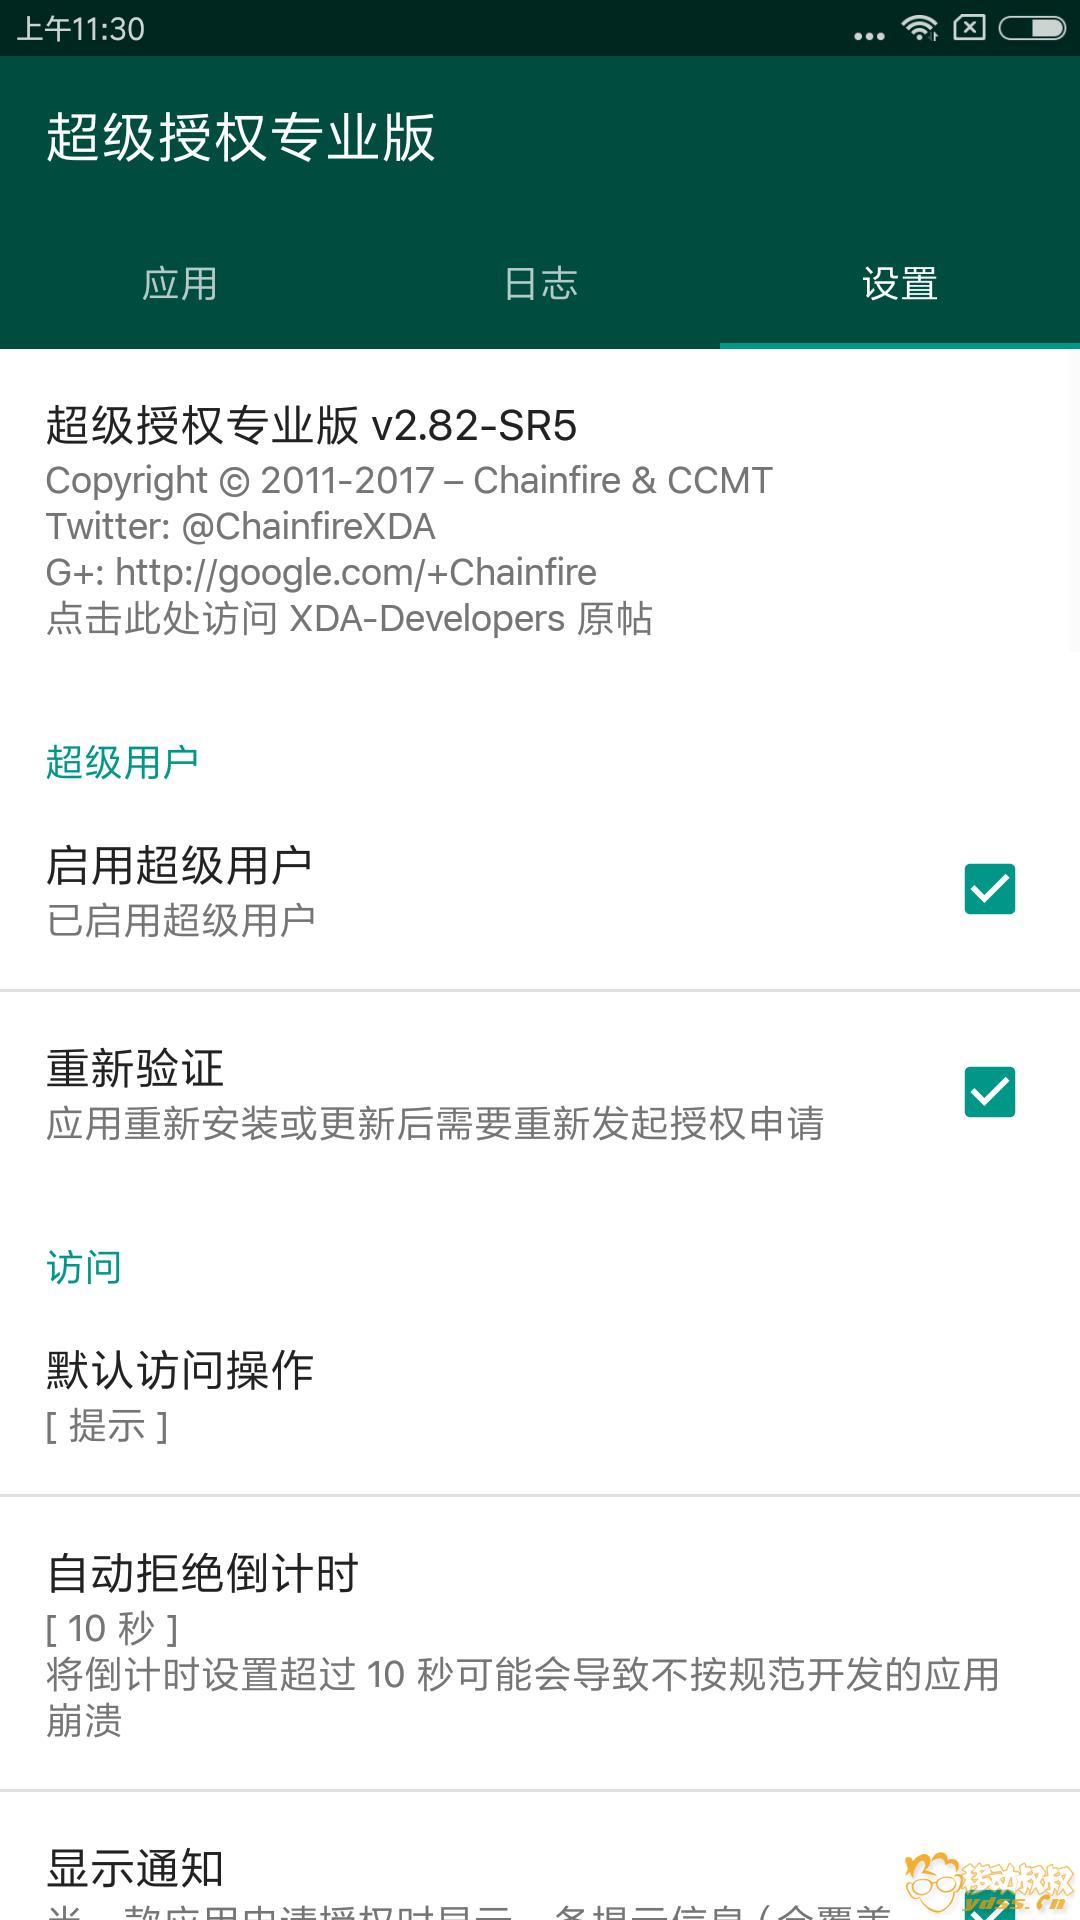 Screenshot_2018-03-23-11-30-31-067_eu.chainfire.supersu.png